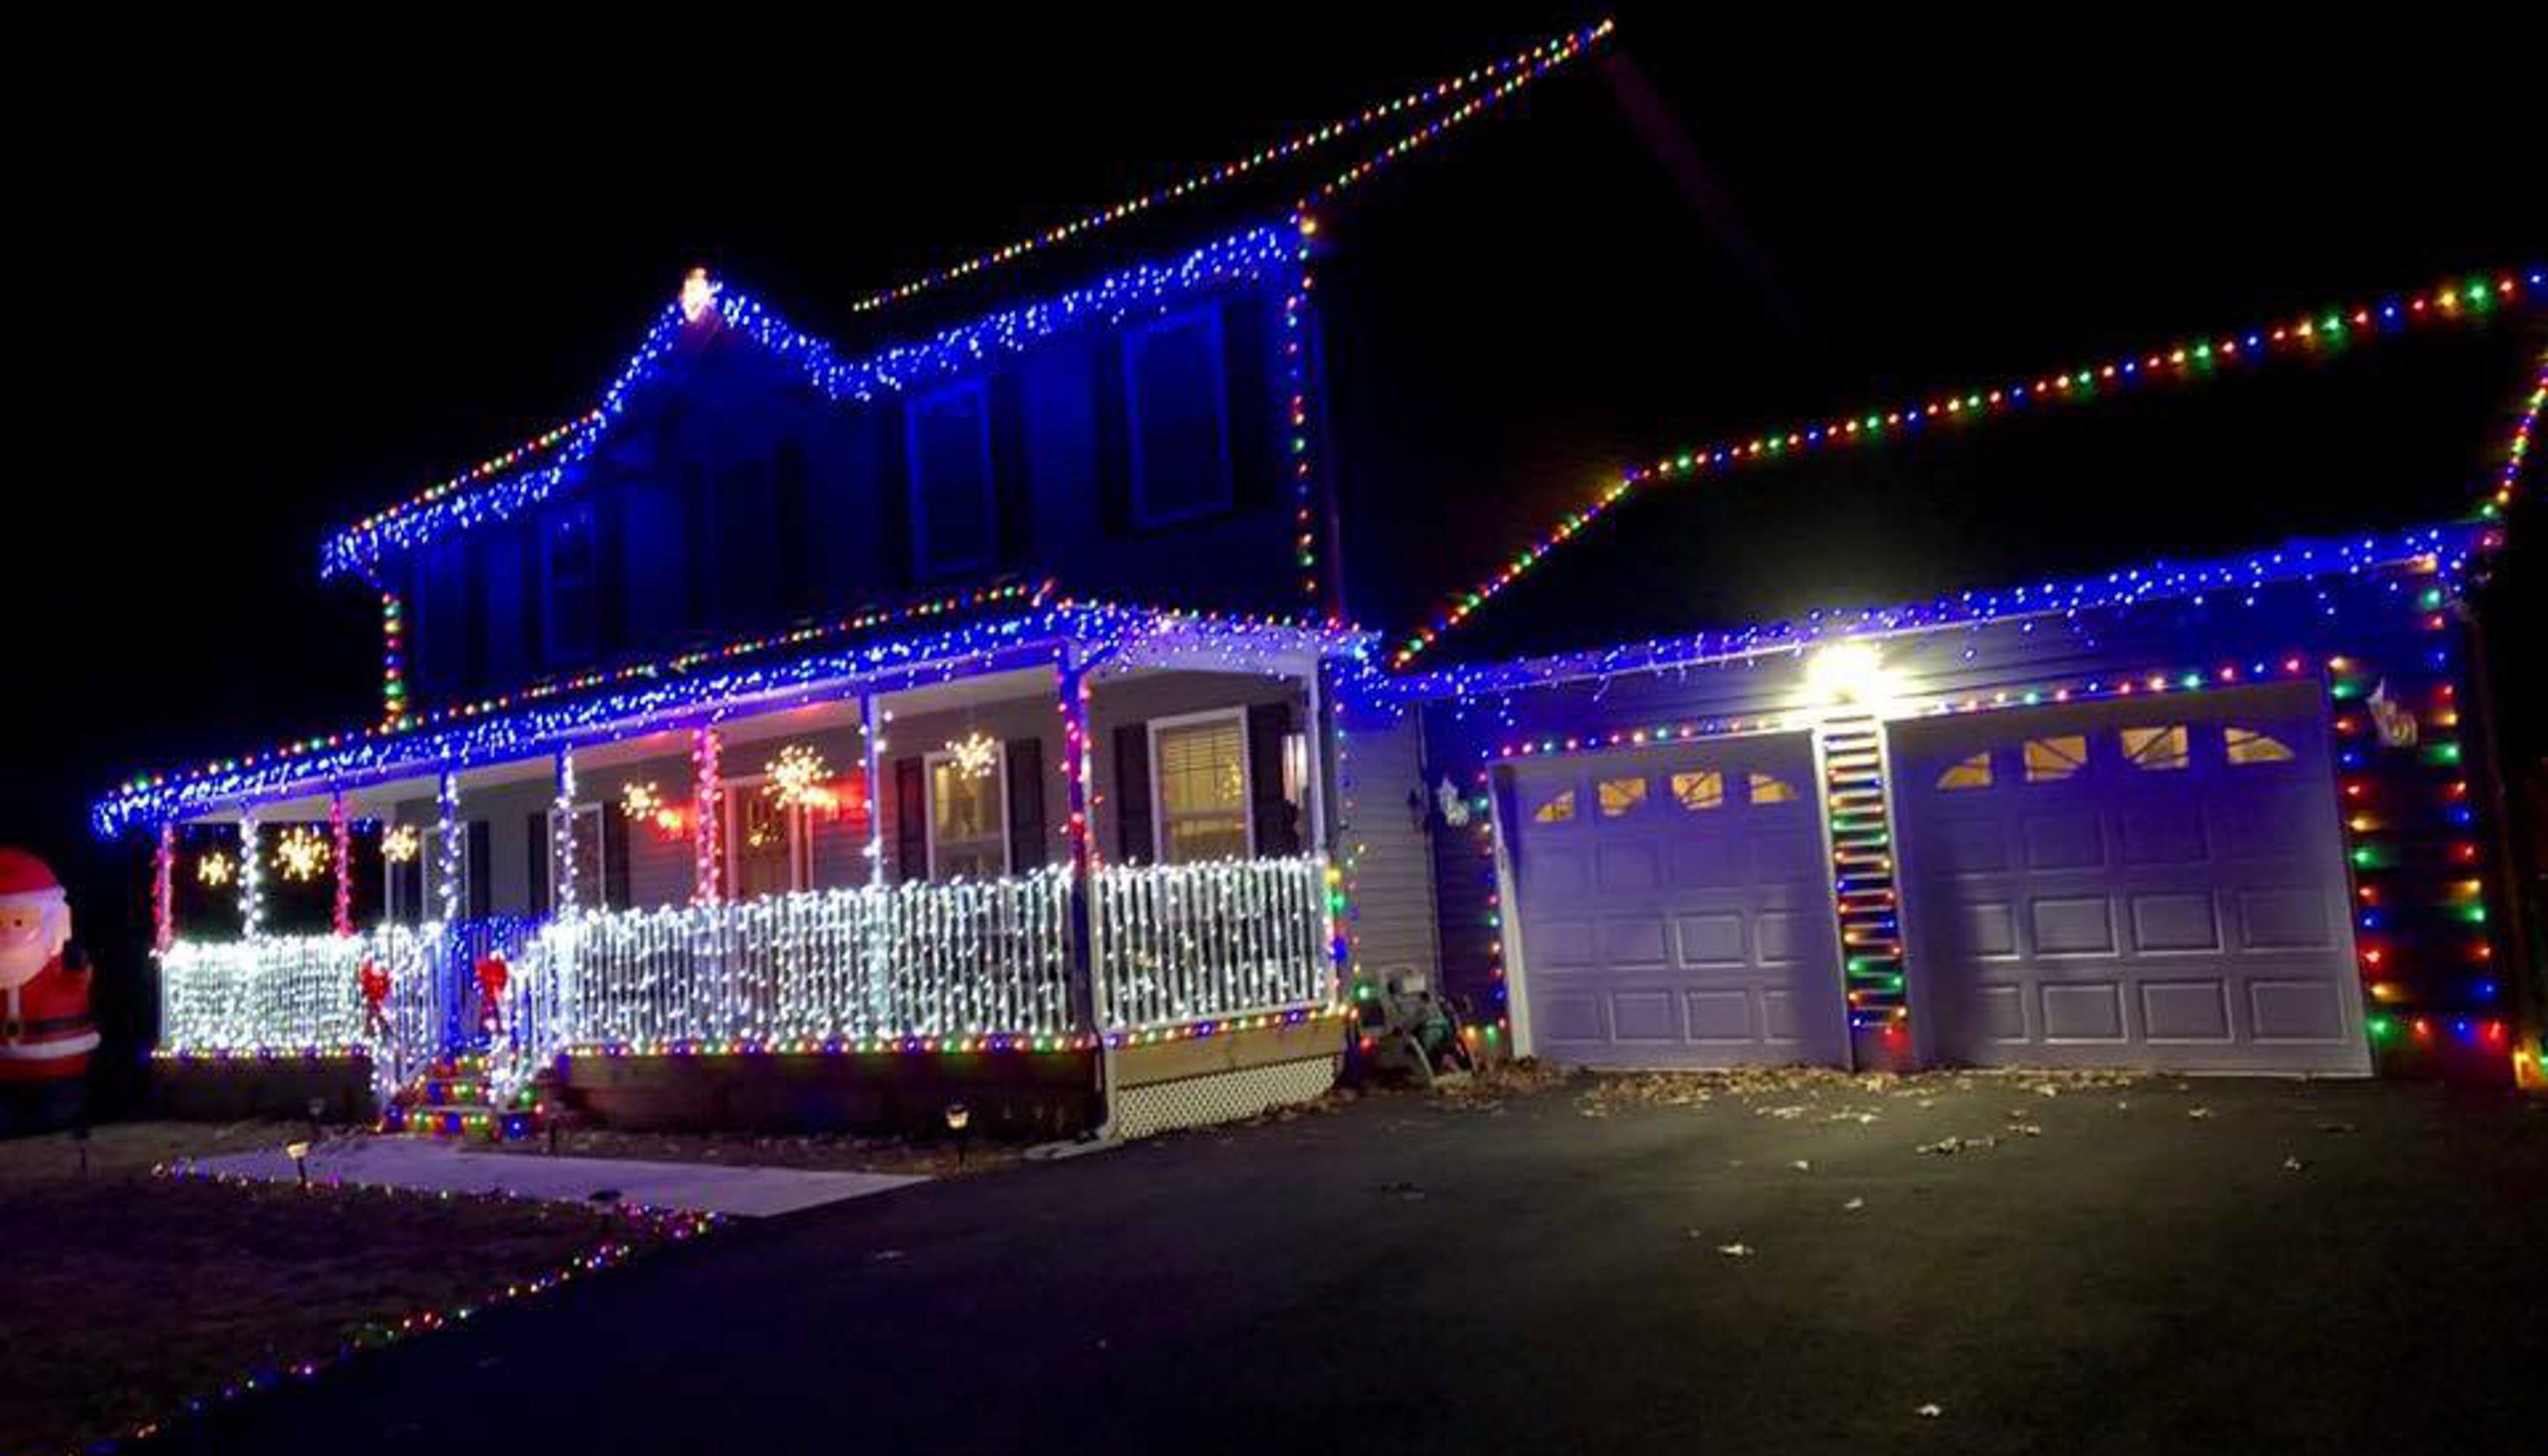 Christmas Light Show Near Me 2020.2020 Christmas Light Shows Near Me Dxehxr